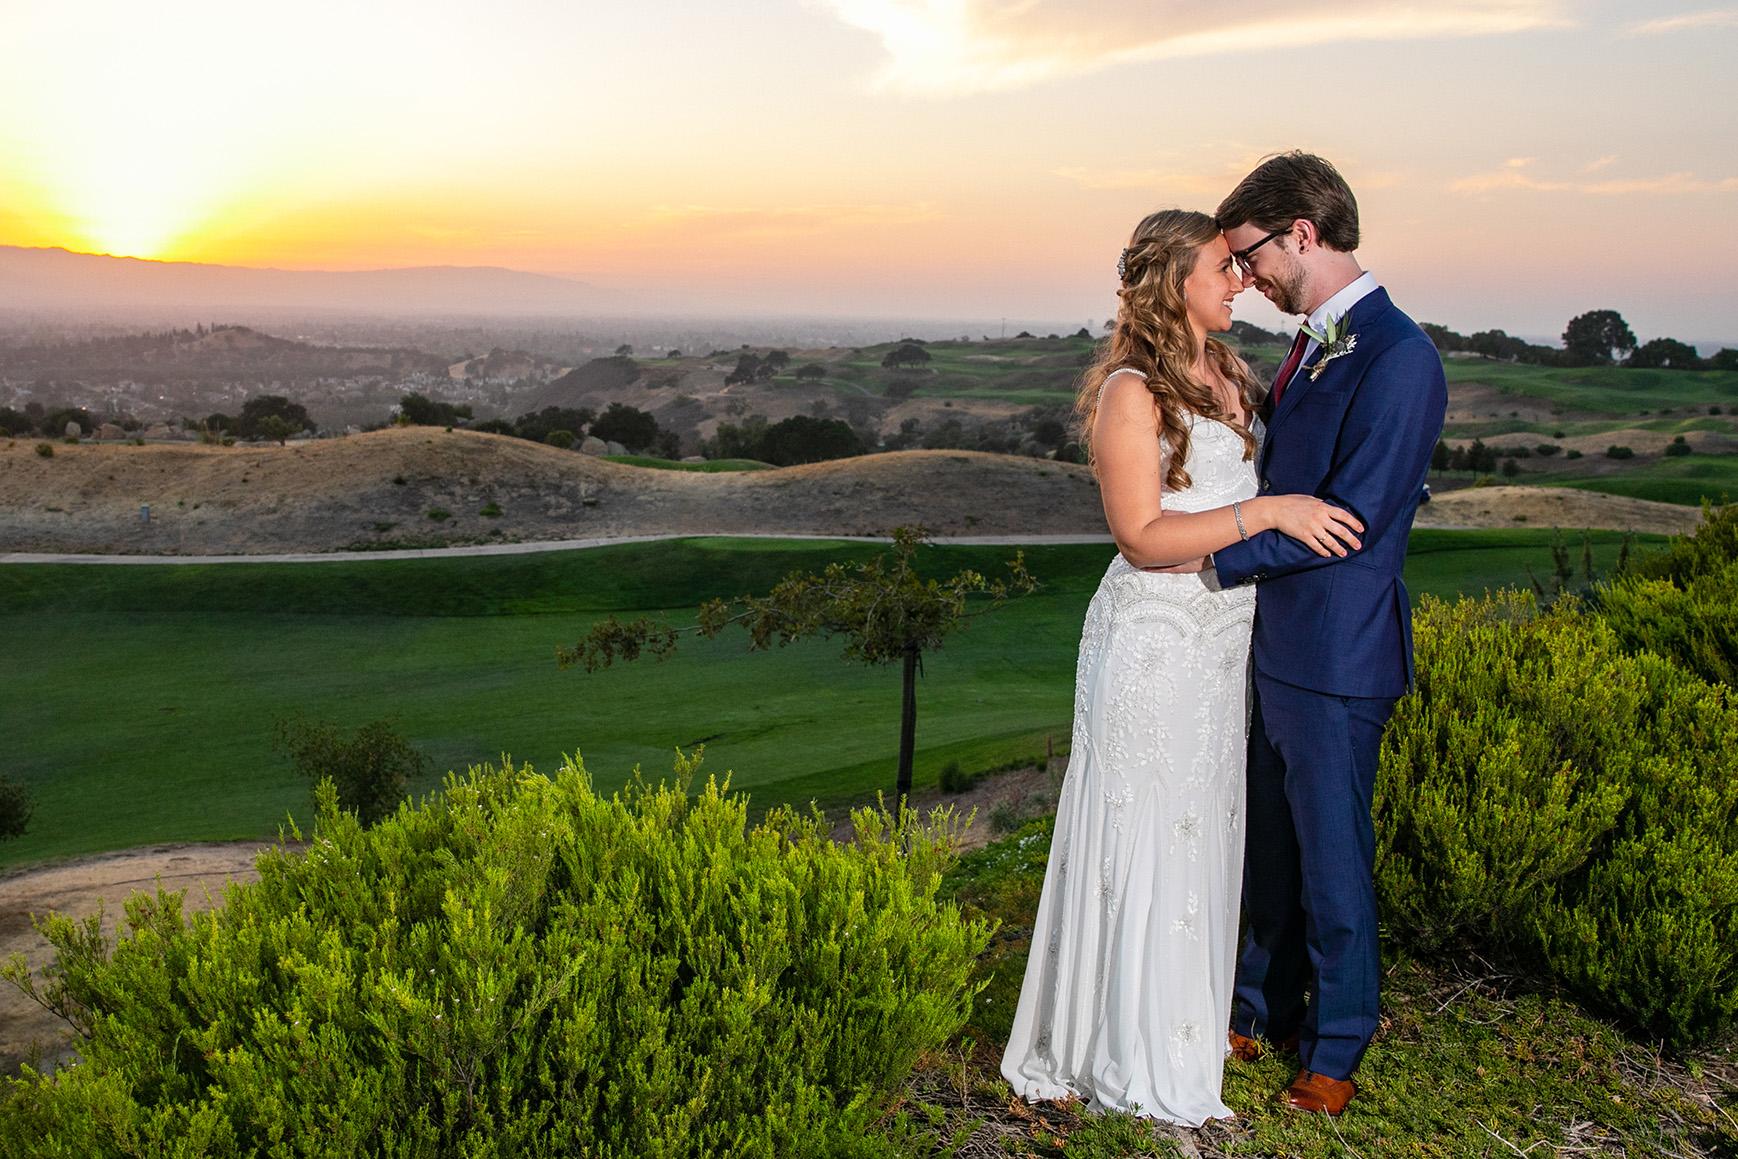 Smiling Couple - Boulder Ridge - Los Gatos, California - San Jose, California - Santa Clara County - Wedgewood Weddings